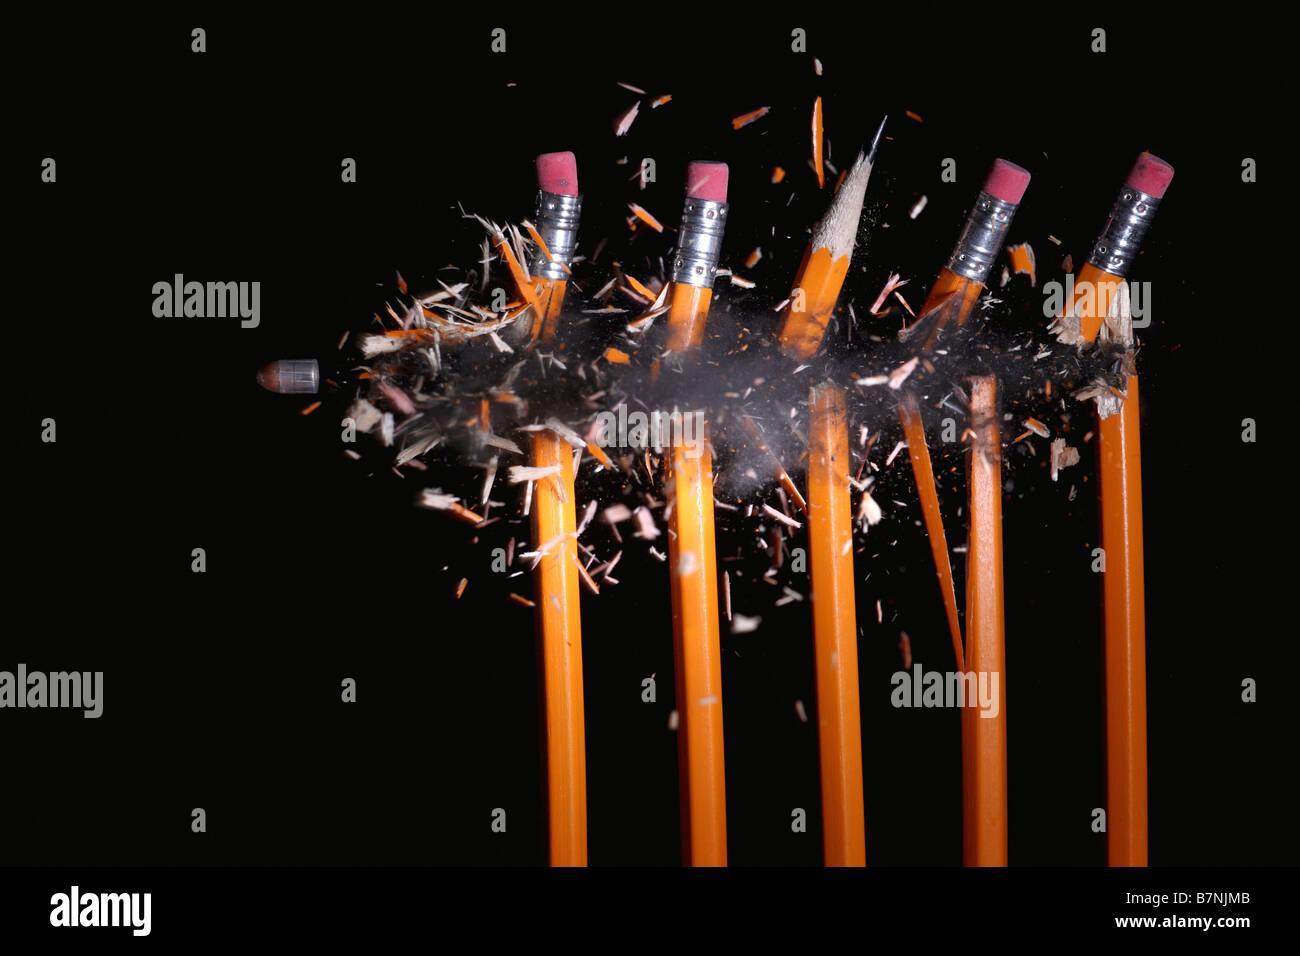 A bullet hitting pencils - Stock Image